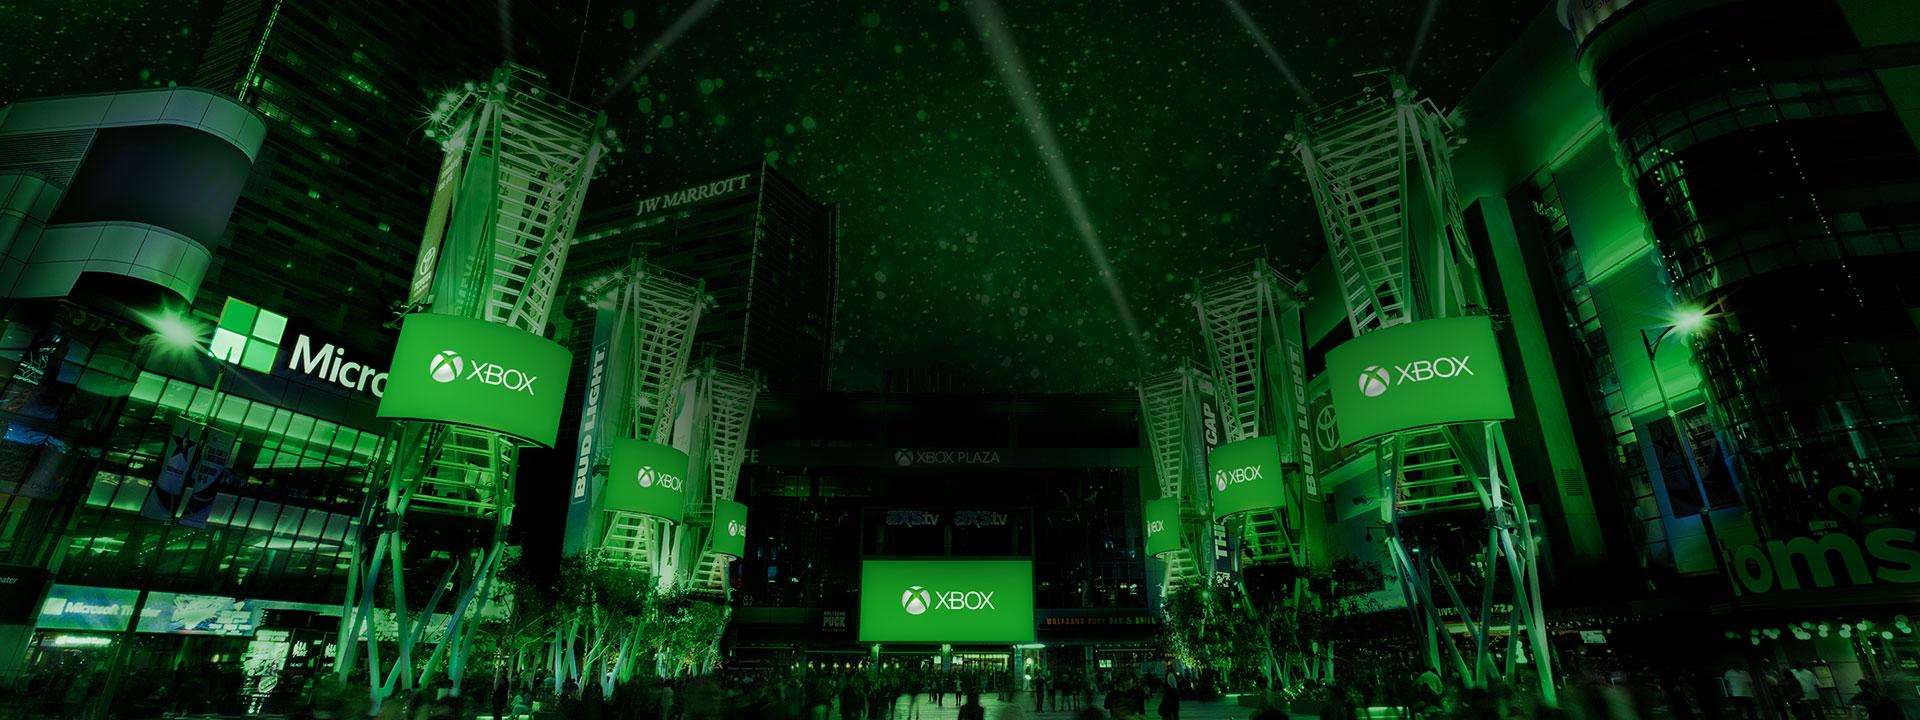 Ubisoft E3 2019 live stream: Watch Ubisoft's E3 press conference live right here